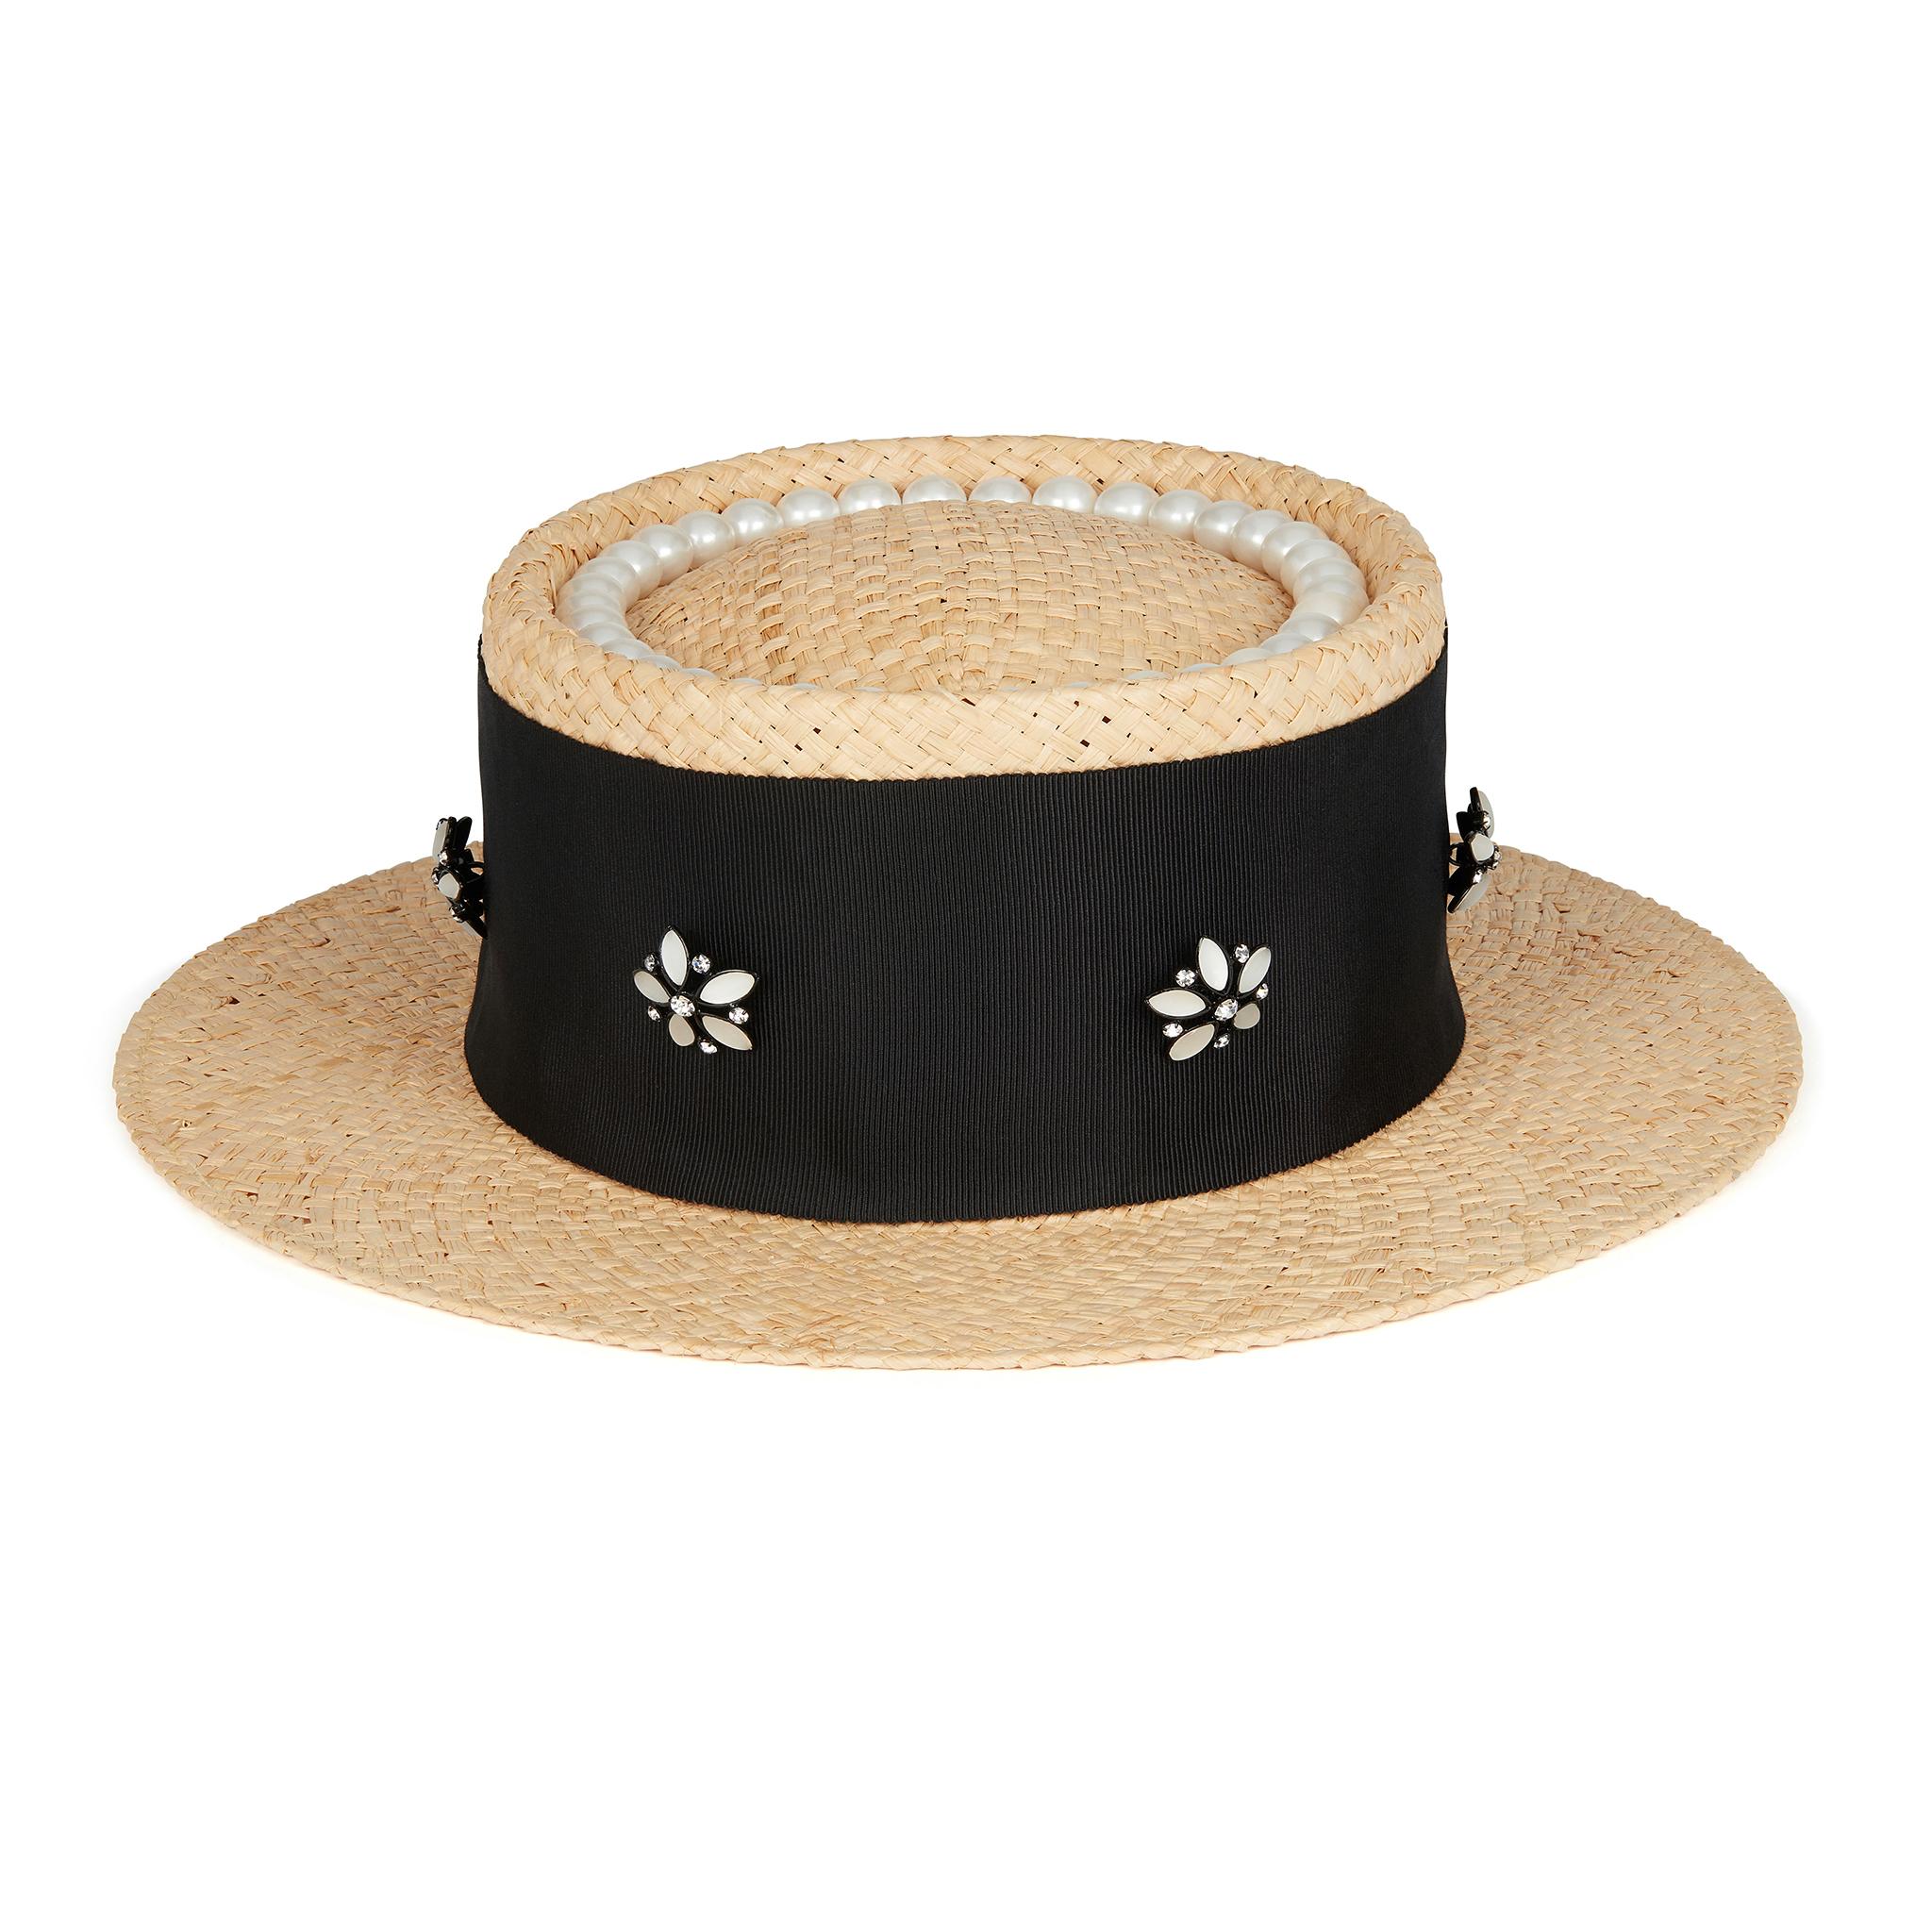 LRP-SM-Benoit-hats_05.jpg